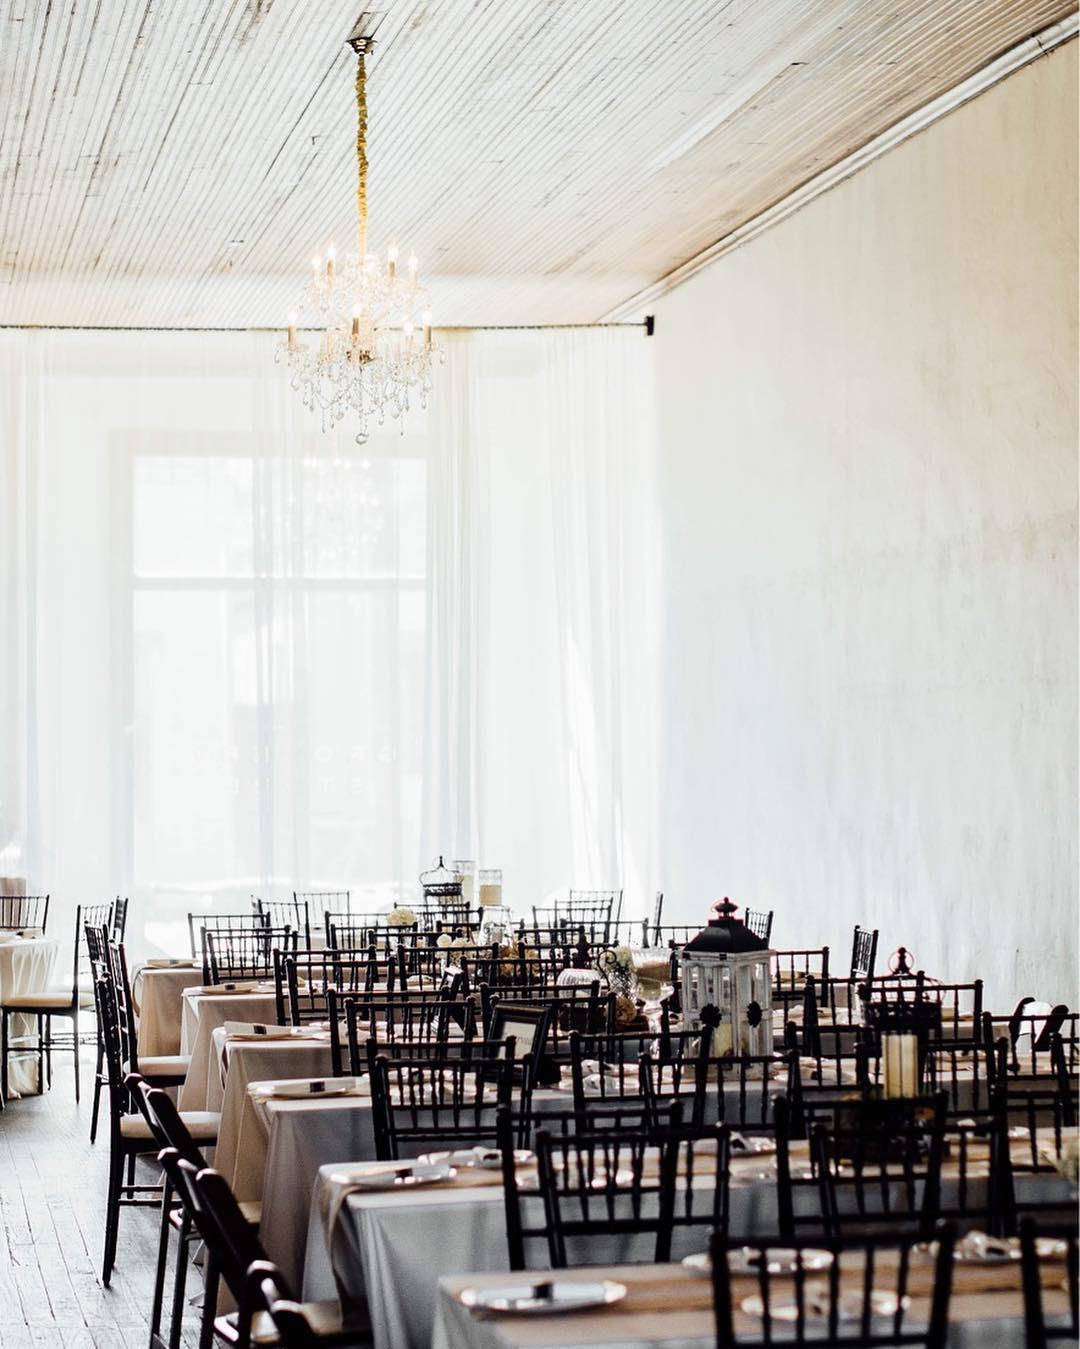 Outdoor Wedding Venues In Georgia: 36 Of Georgia's Most Gorgeous Wedding Venues